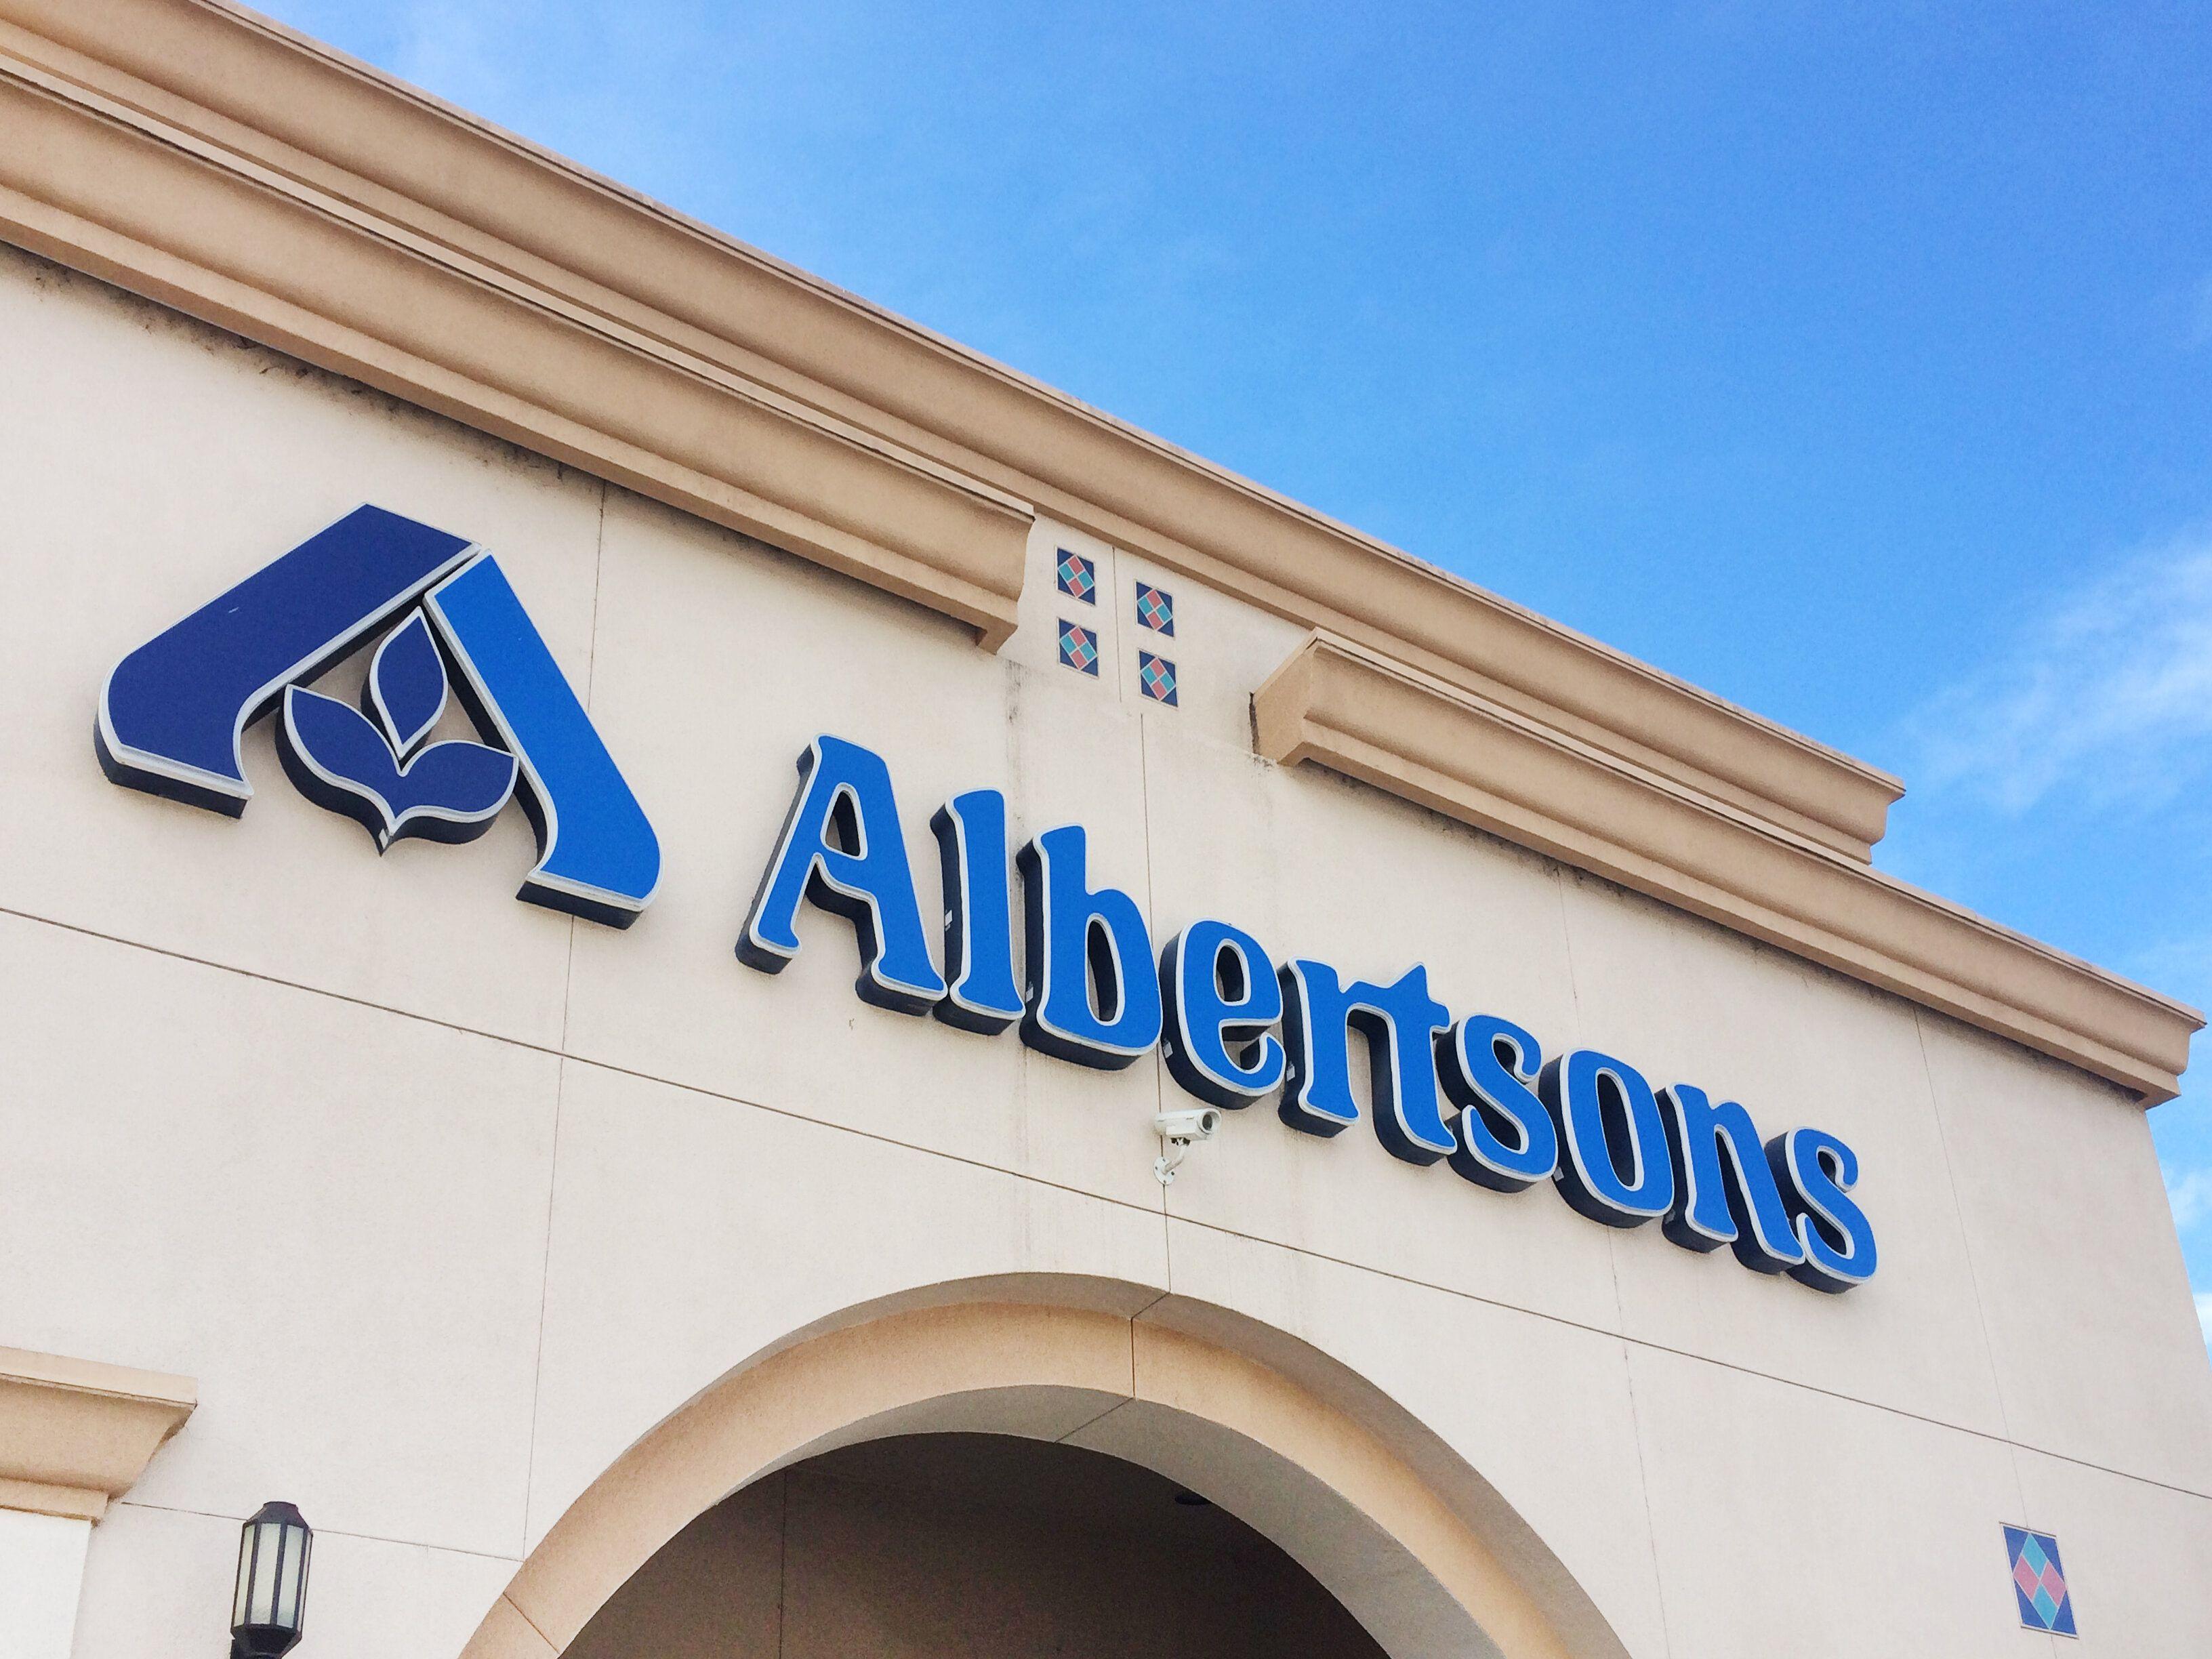 An Albertsons store in Buellton, California.